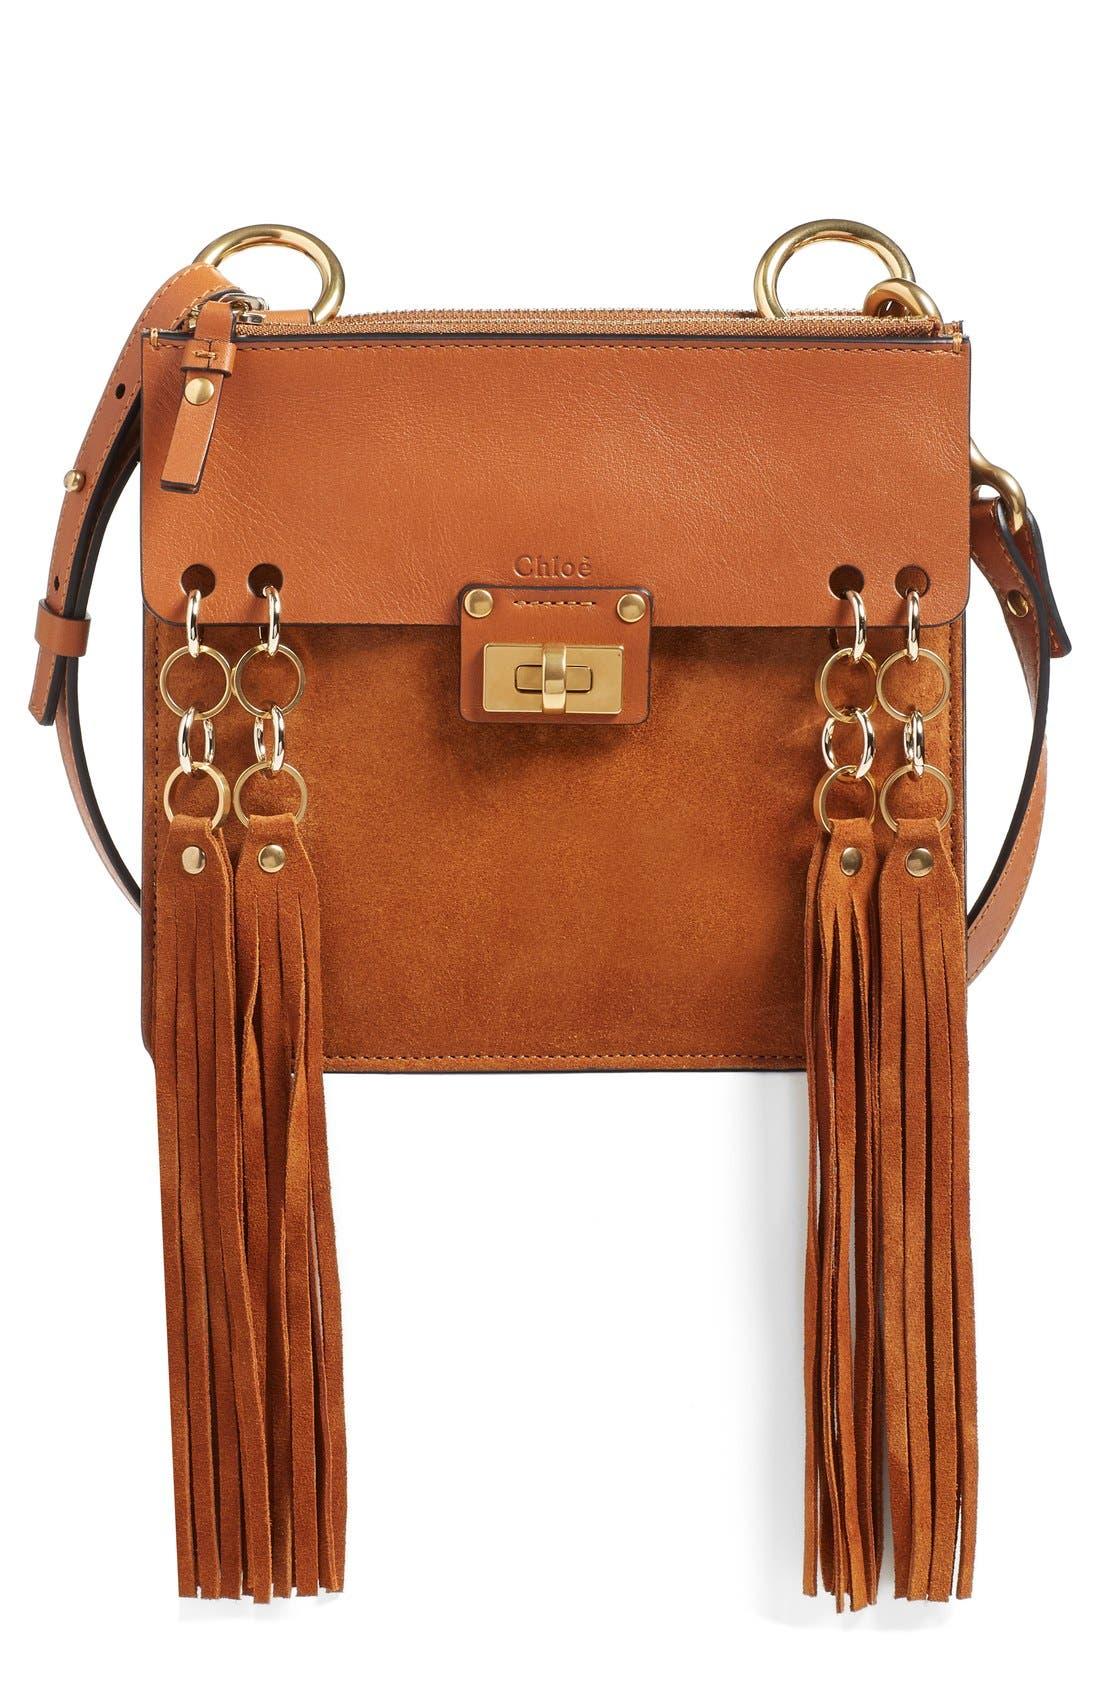 Main Image - Chloé 'Small Jane' Tassel Suede & Leather Crossbody Bag